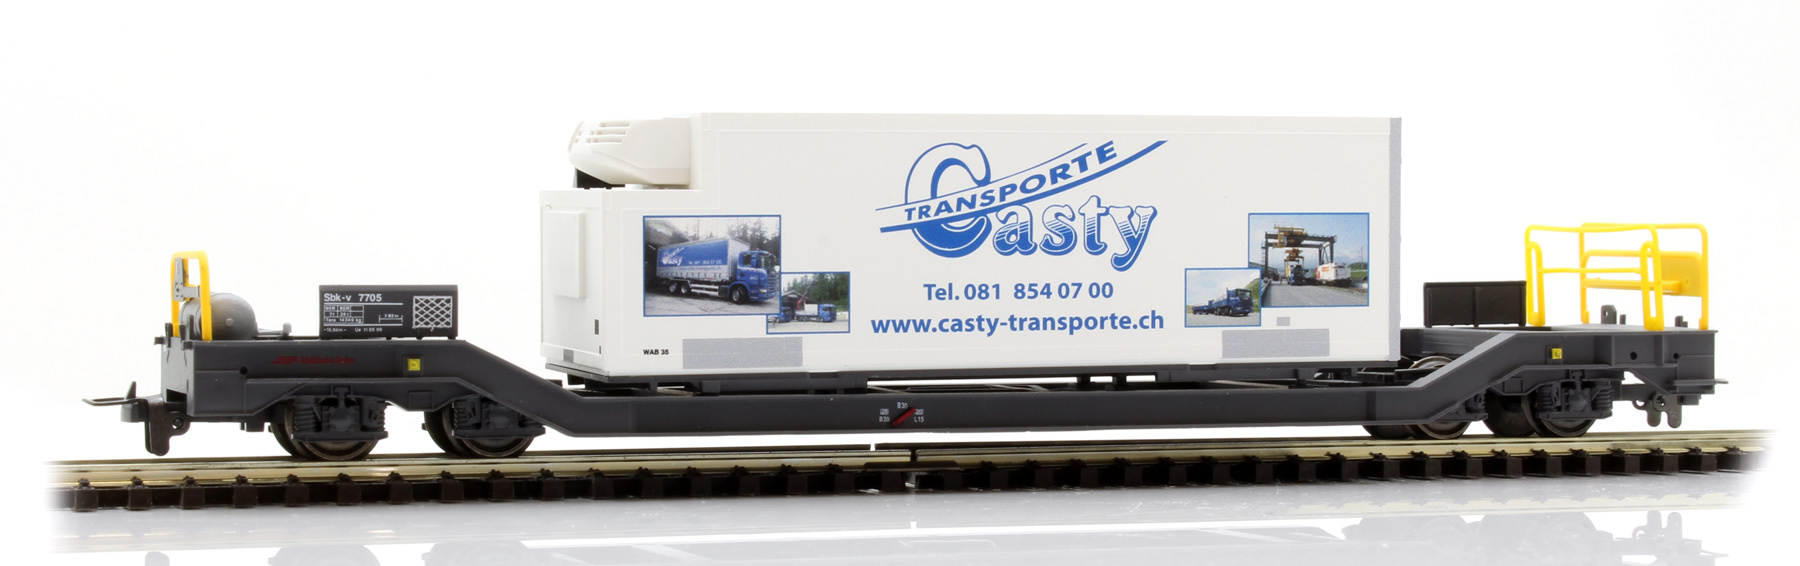 "2289115 RhB Sbk-v 7705 mit Kühlcontainer ""Casty""-1"